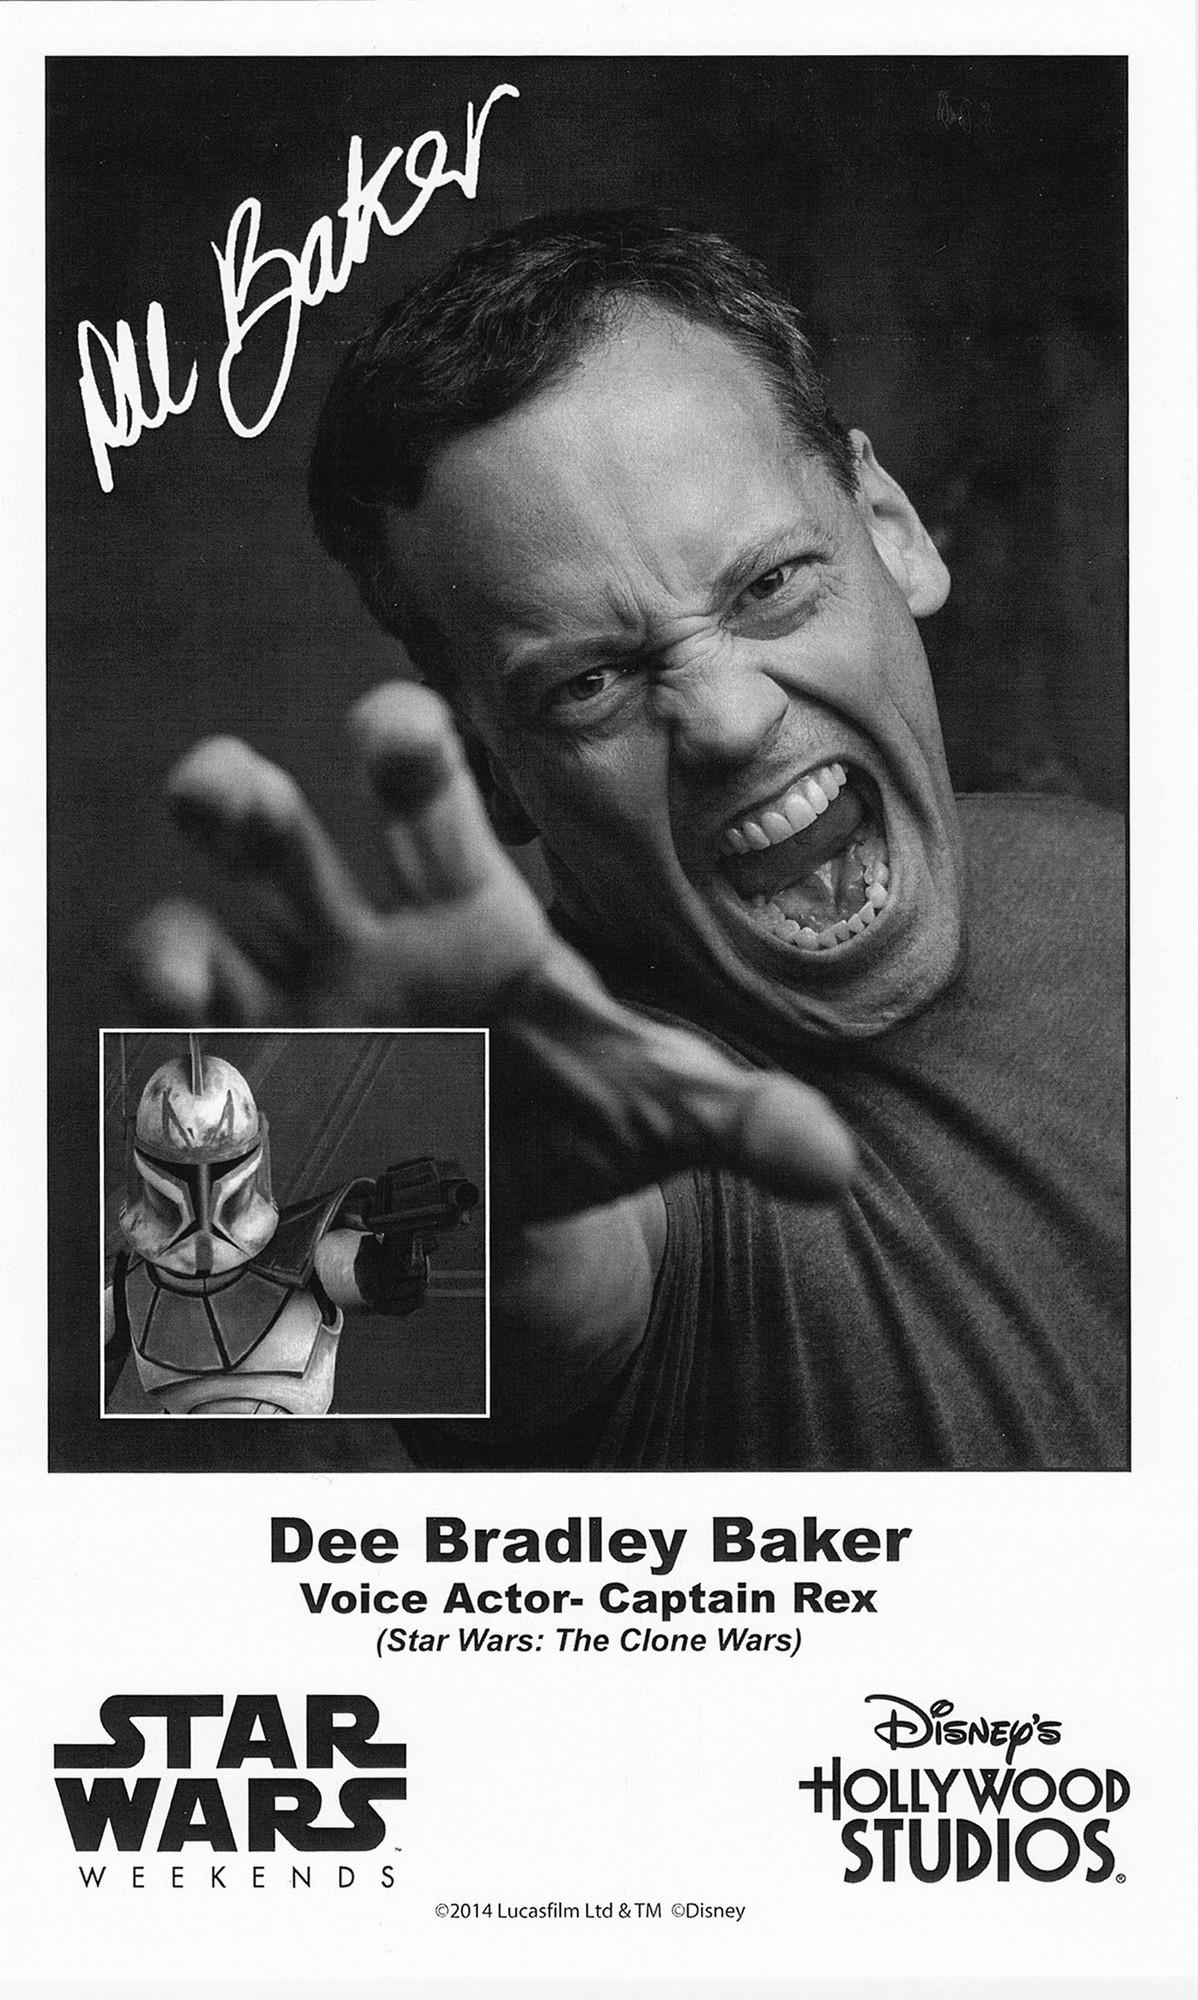 Dee Bradley Baker the voice of Captain Rex Presigned Official Star Wars Weekends 2014 Celebrity Collector Photo © Dizdude.com